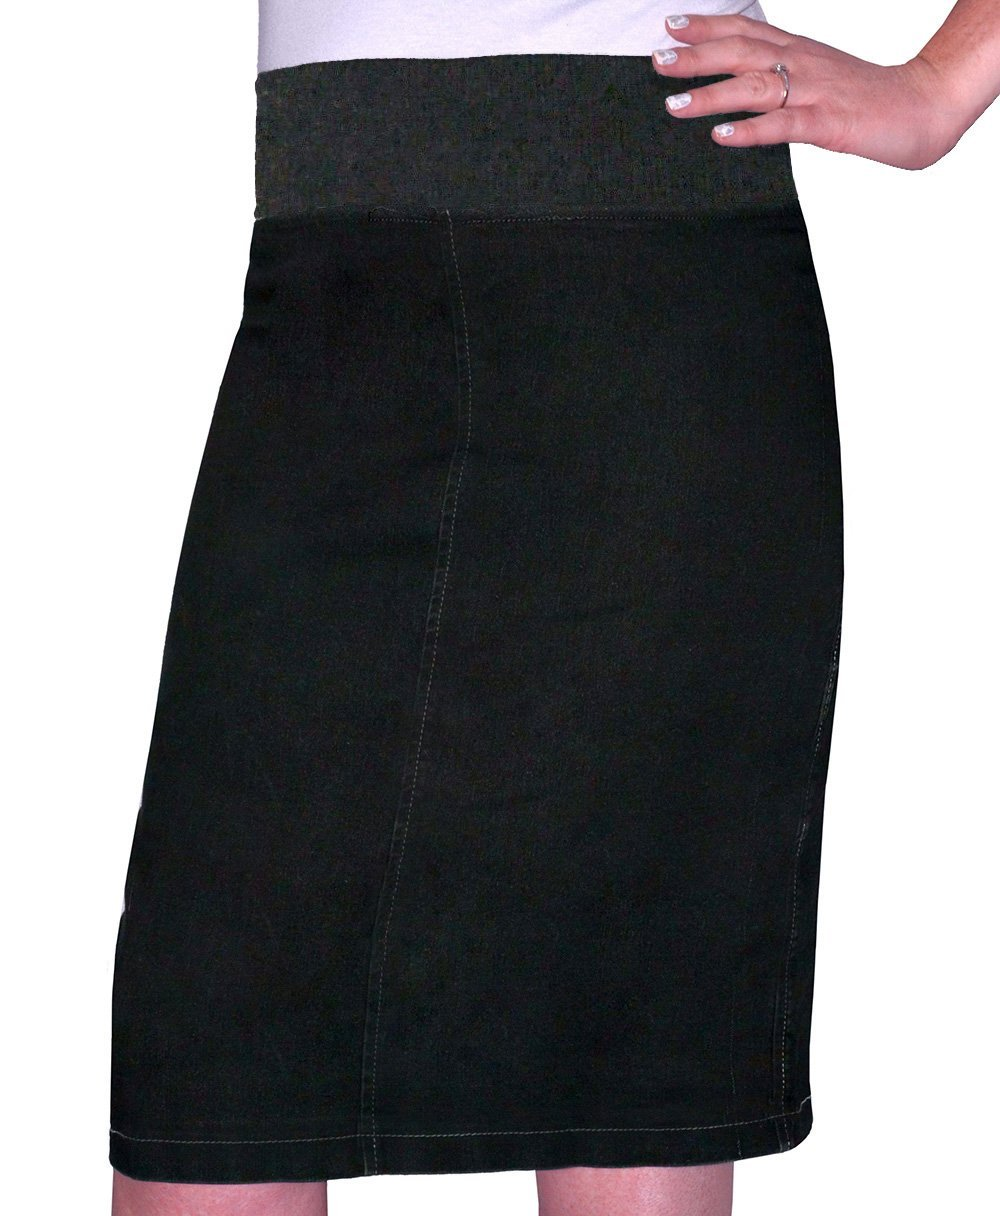 Kosher Casual Kid's Big Girls' Modest Straight Midi Length Denim Skirt Stretch Waistband No Slits Size 6 Stonewash Black with Black Stitching